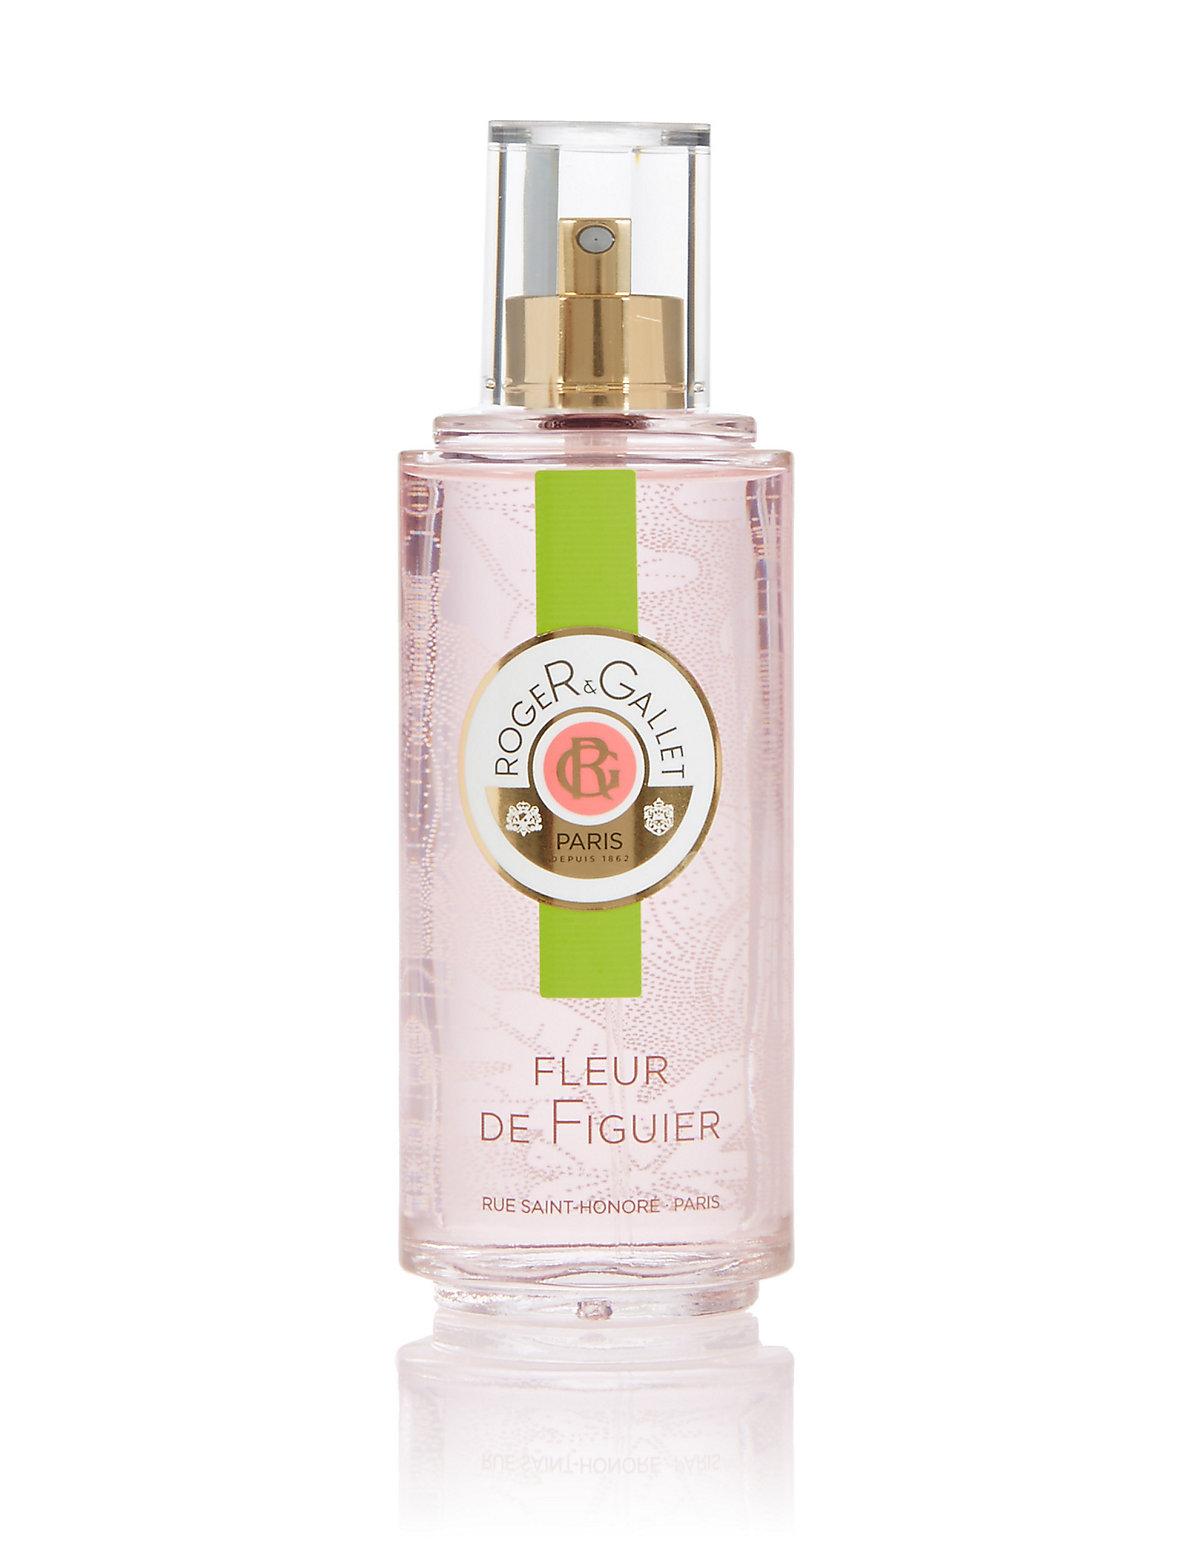 Roger&Gallet Fleur de Figuier Fragrant Water Spray 100ml